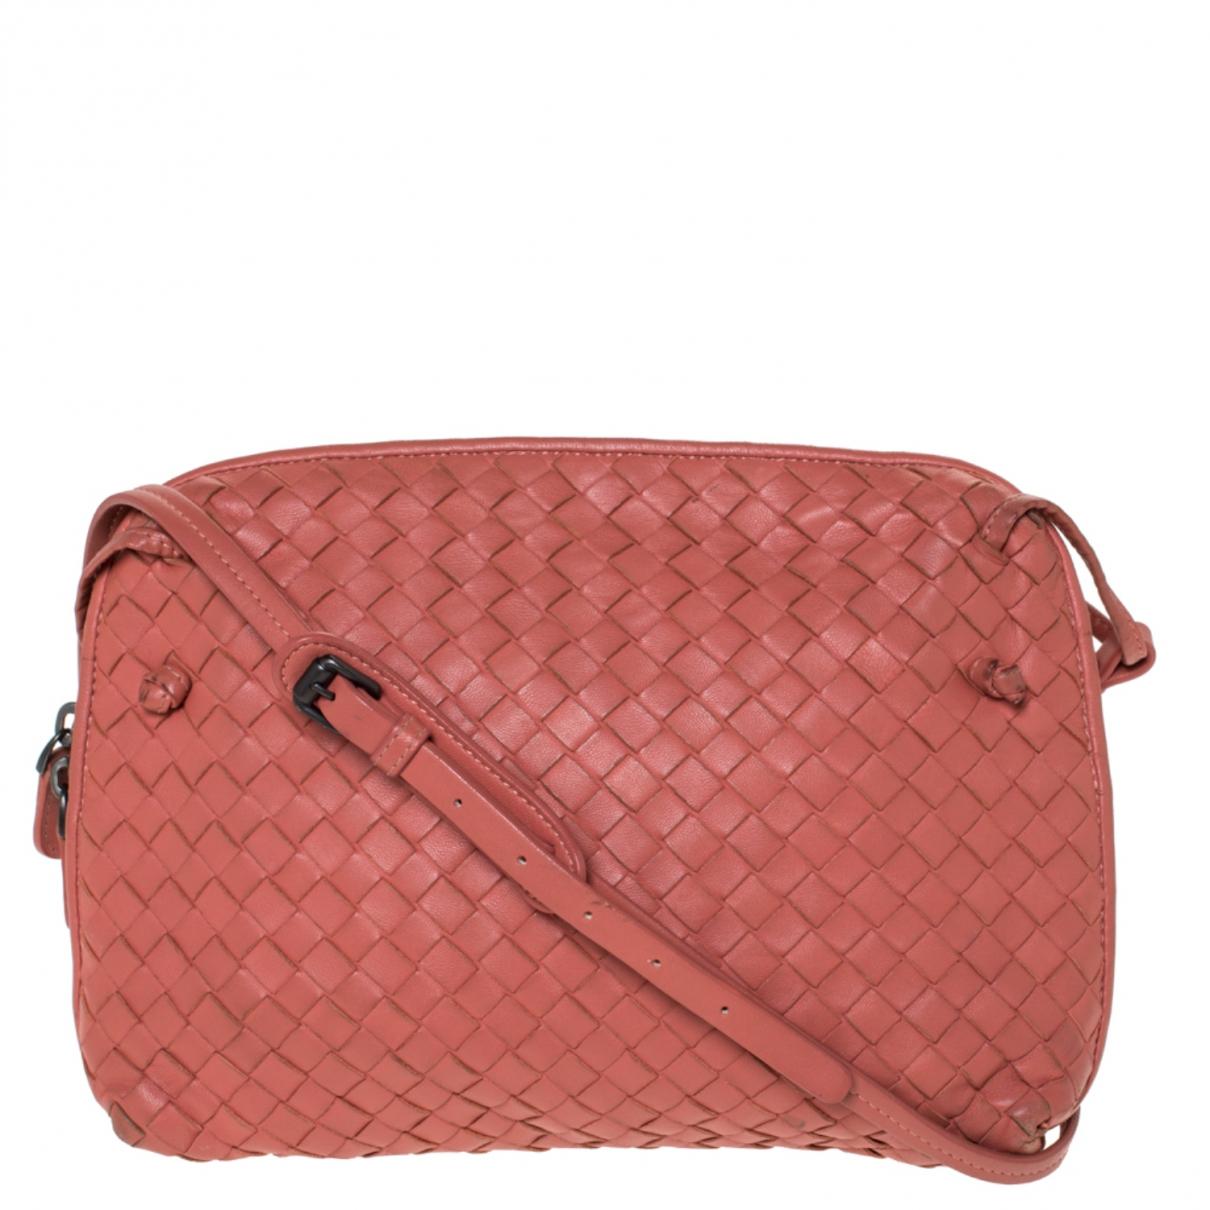 Bottega Veneta - Sac a main Nodini pour femme en cuir - rouge